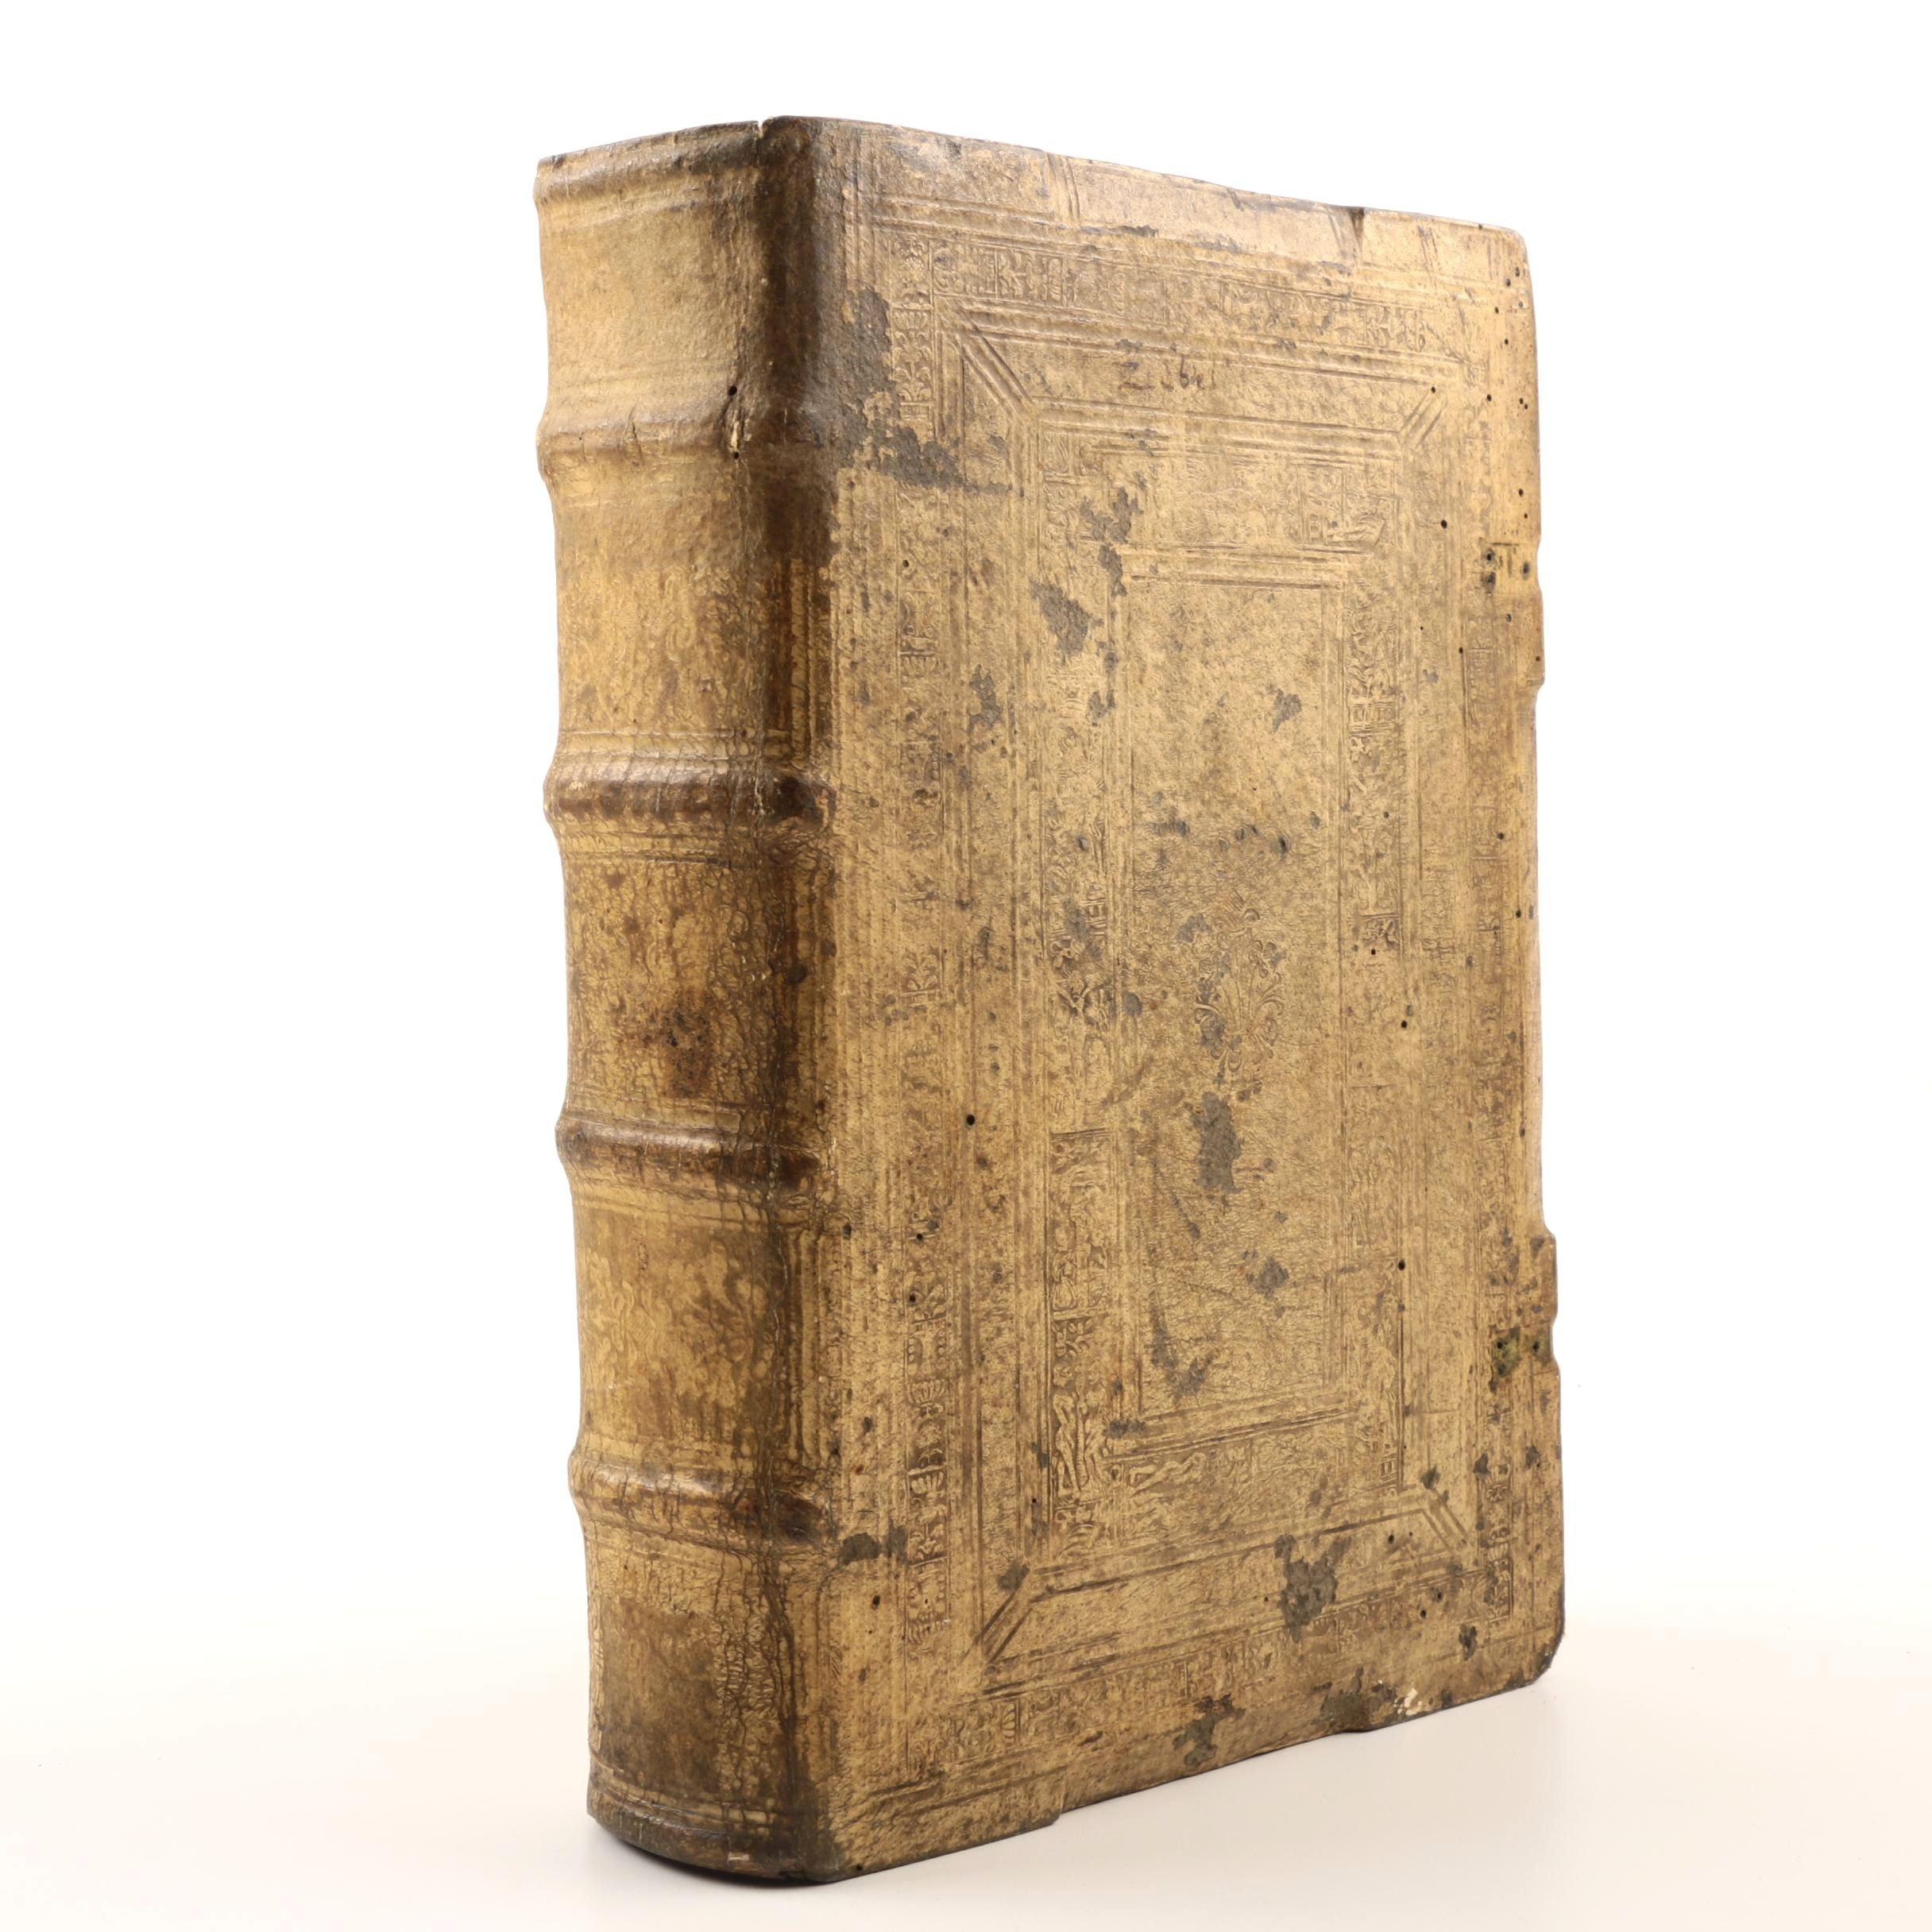 "1535 ""Autores Historiae Ecclesiasticae"" Printed by Hieronymus Froben"